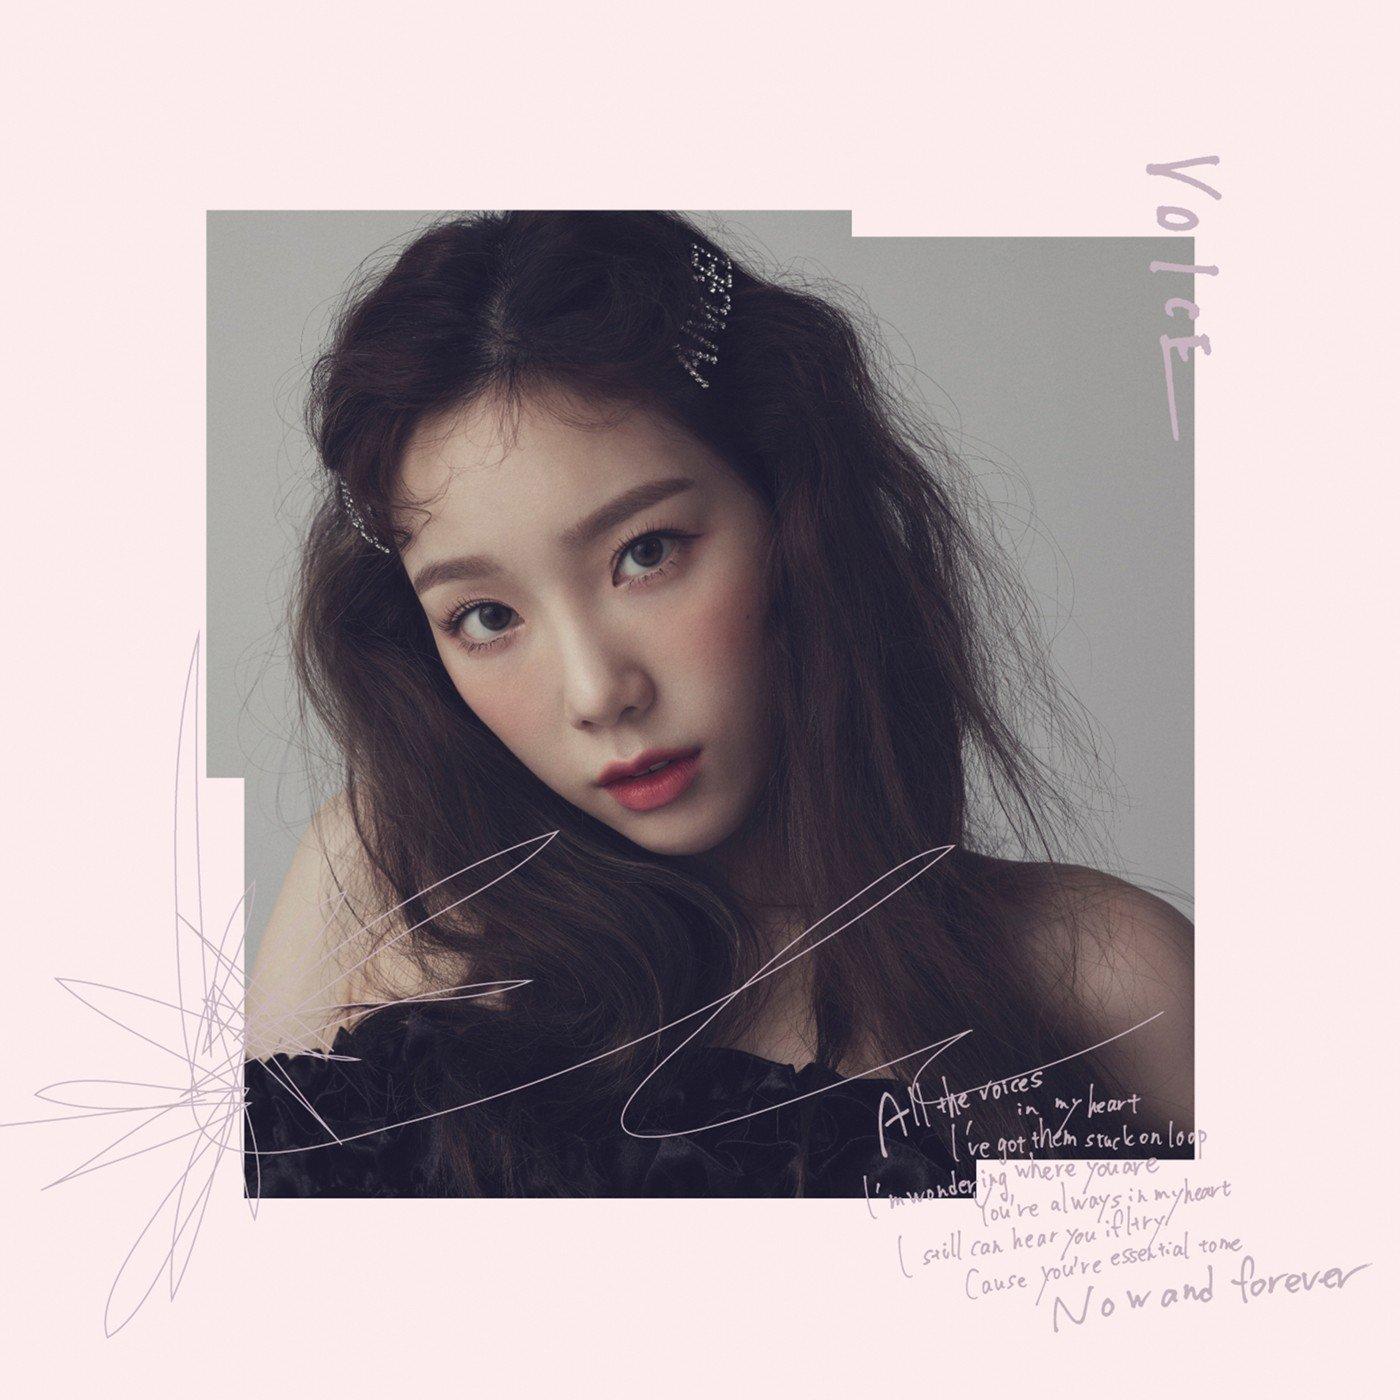 [音楽 – Single] Taeyeon (태연) – VOICE [FLAC / 24bit Lossless / WEB] [2019.05.13]